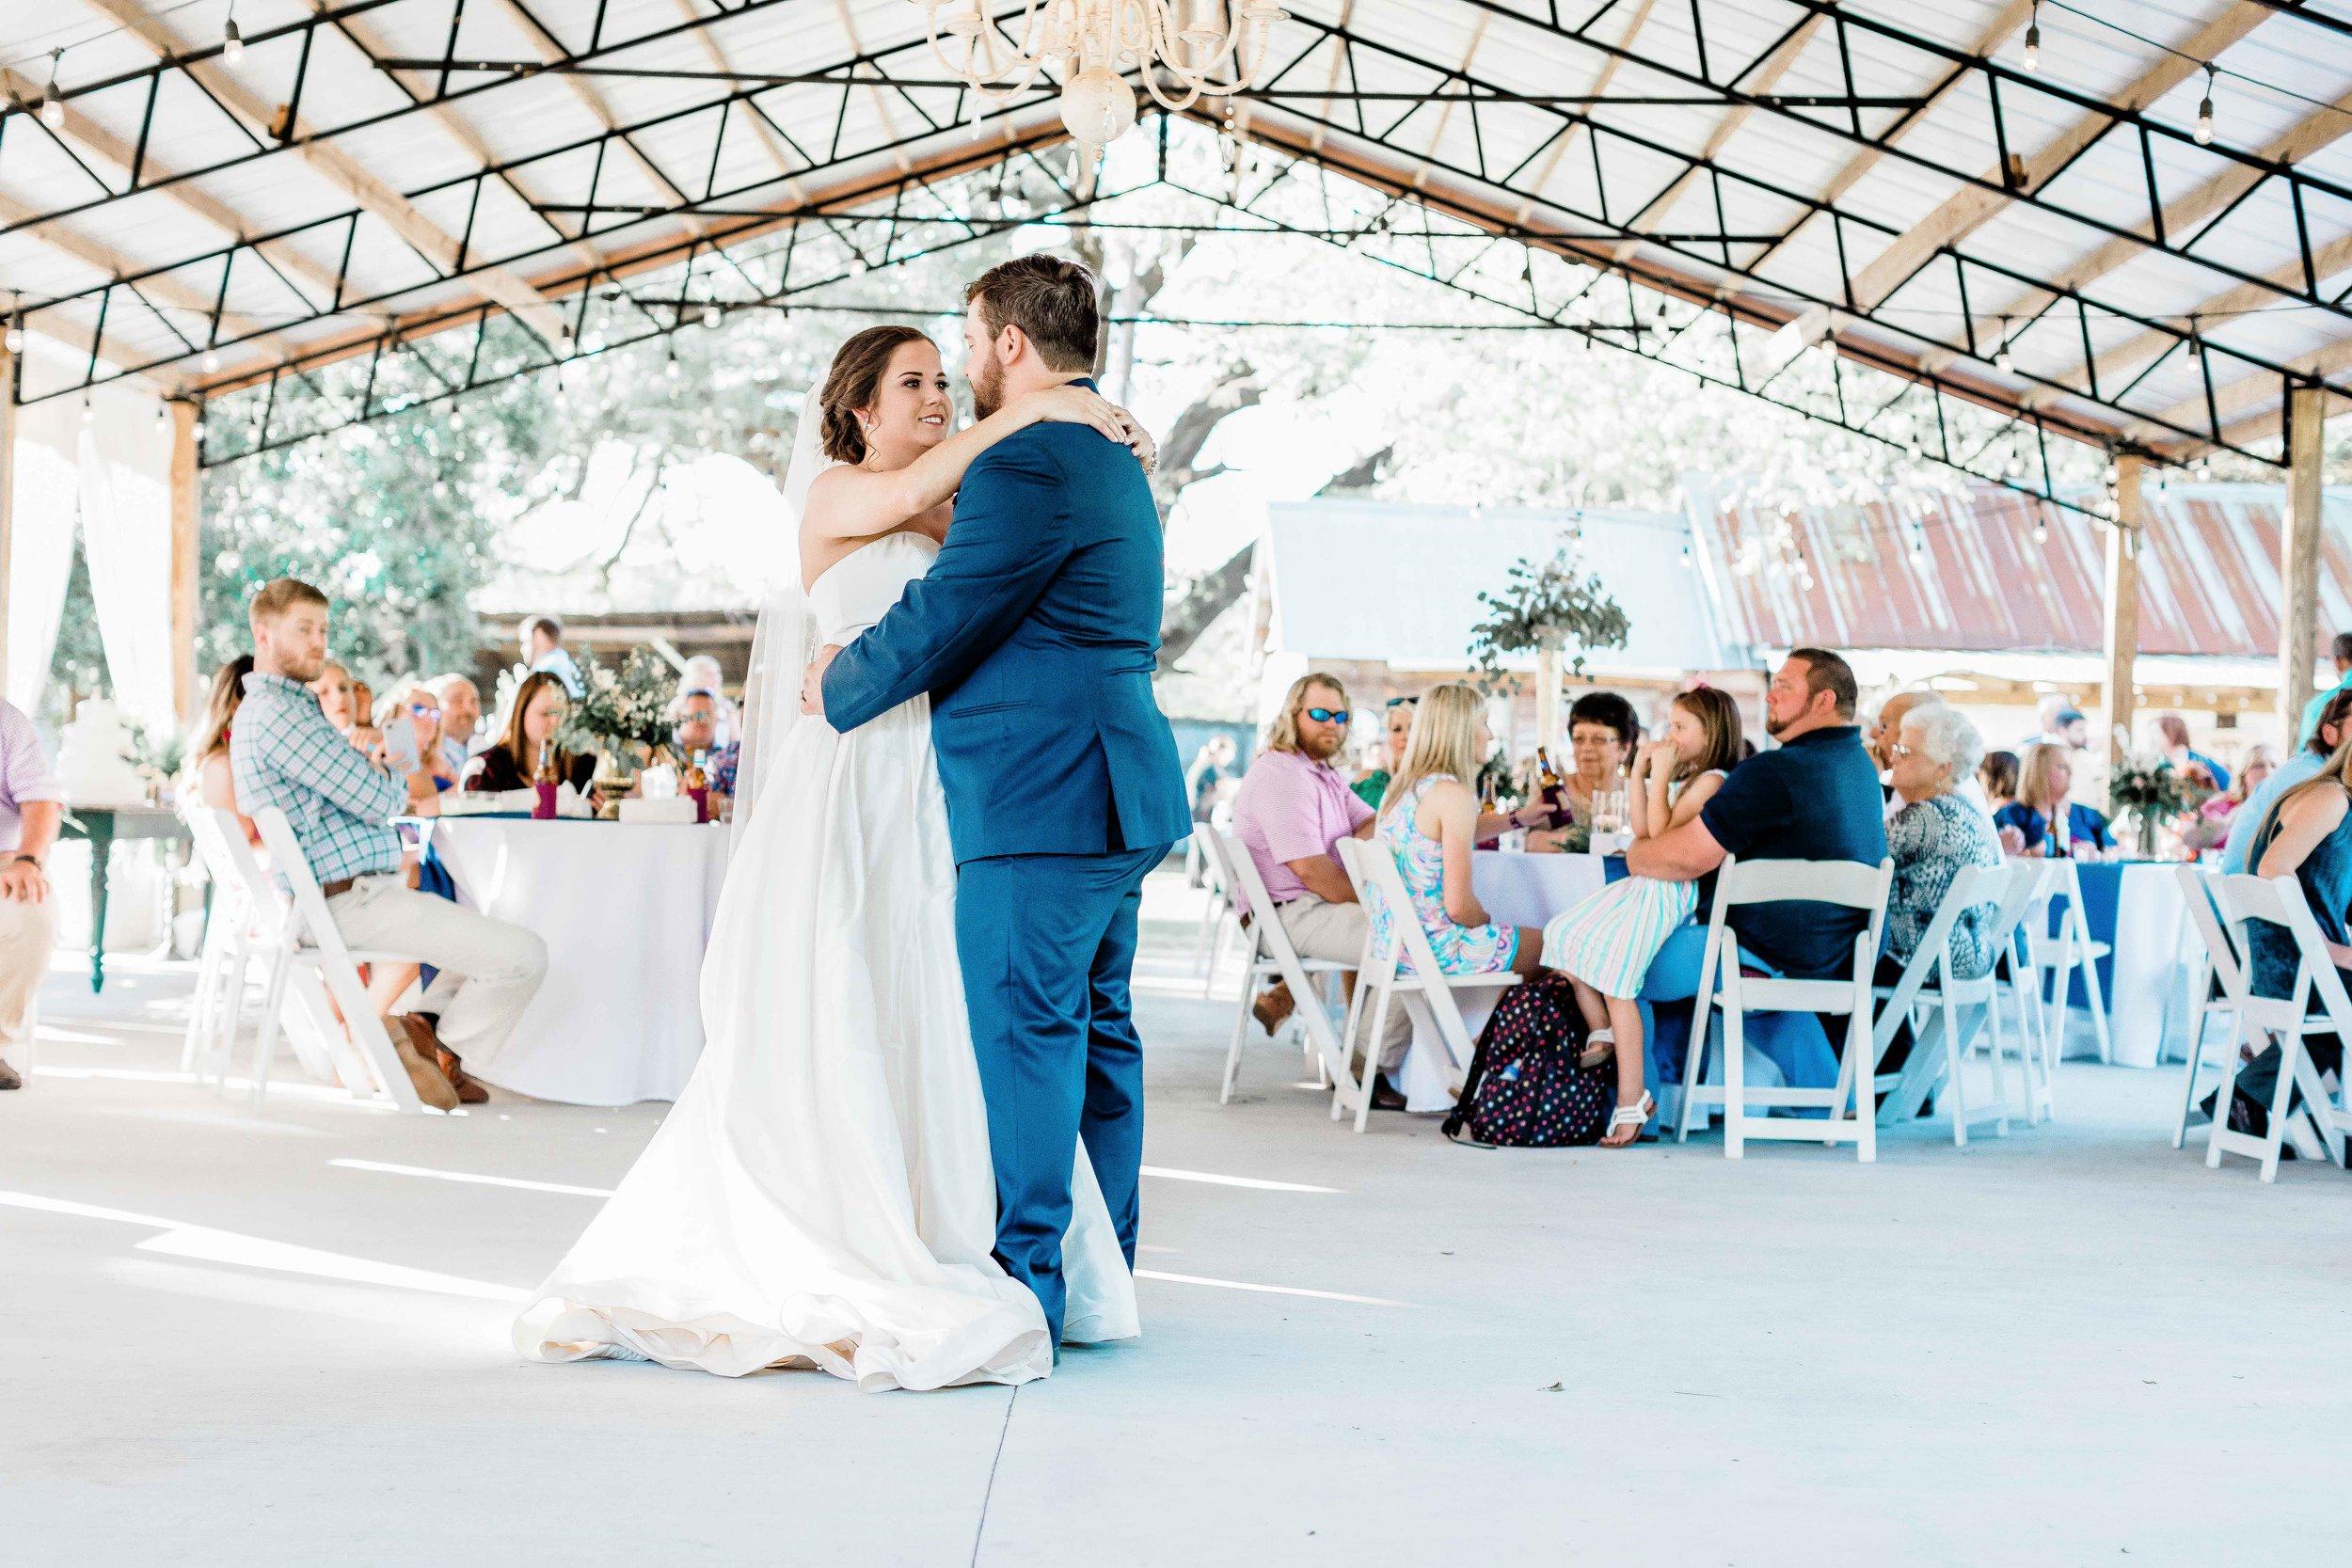 20190427-Southern Lens Photography- Savannah Wedding Photographer-Screven and Caroline-201983.jpg